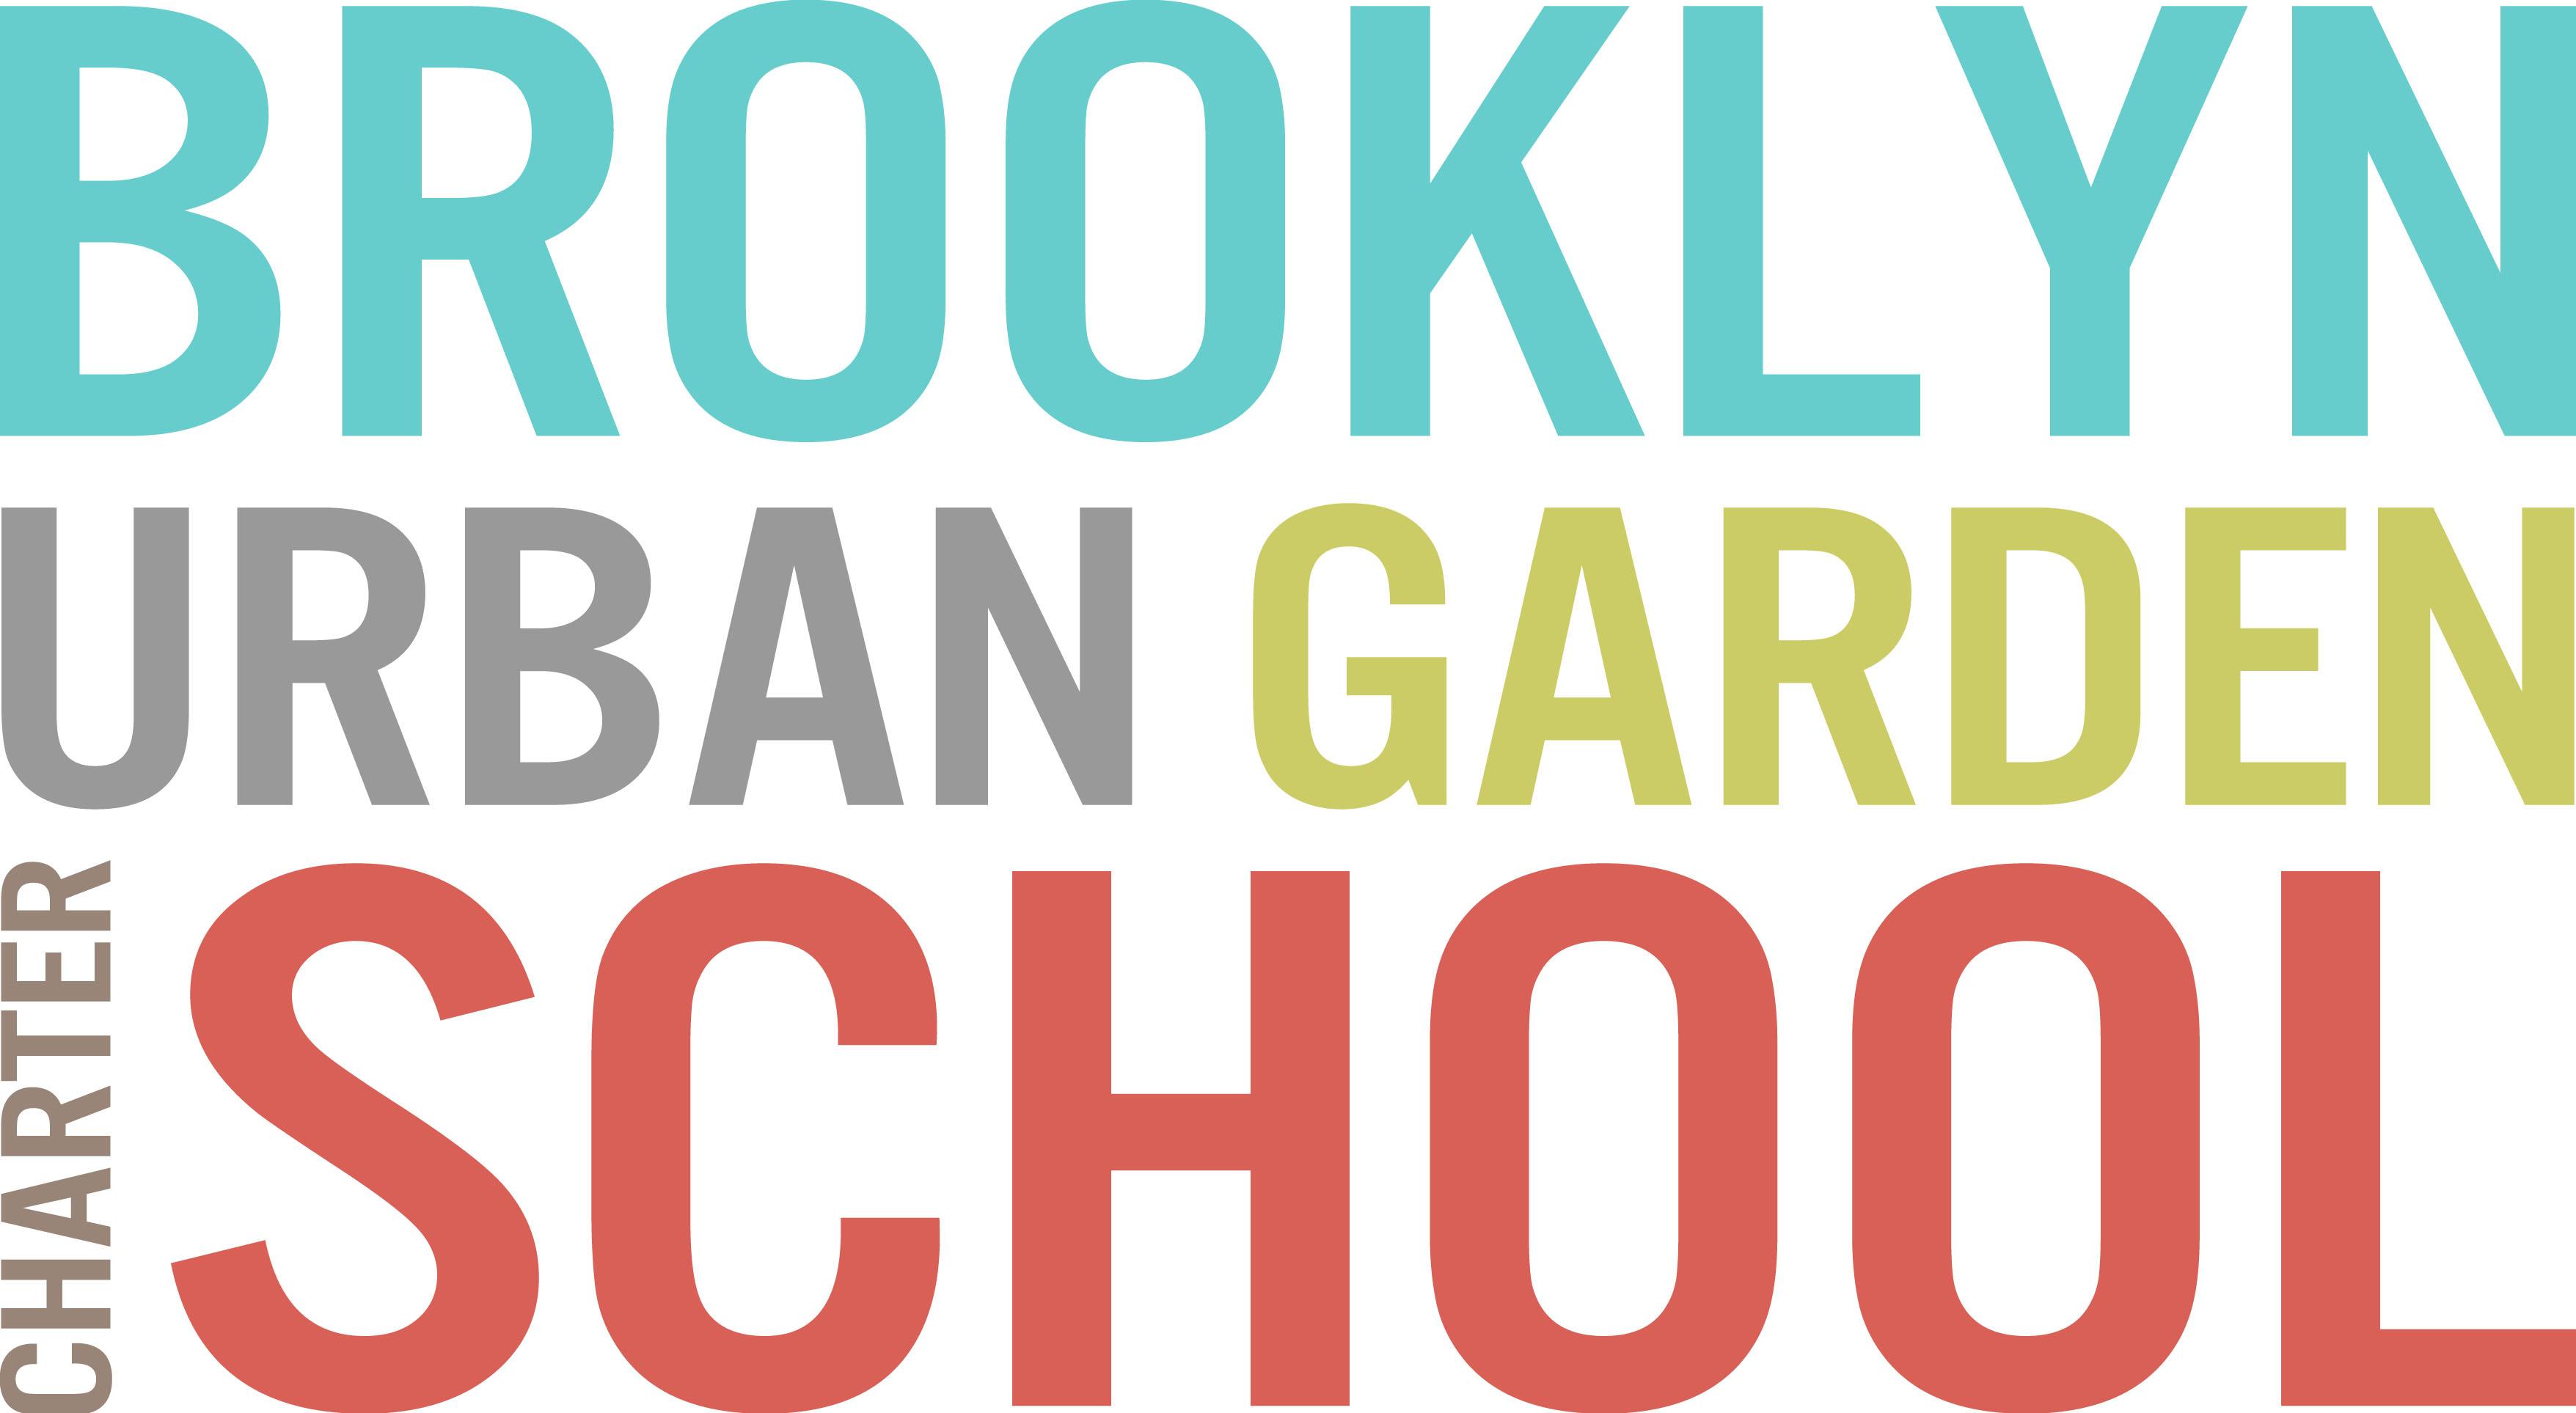 Beautiful Brooklyn Urban Garden Charter School